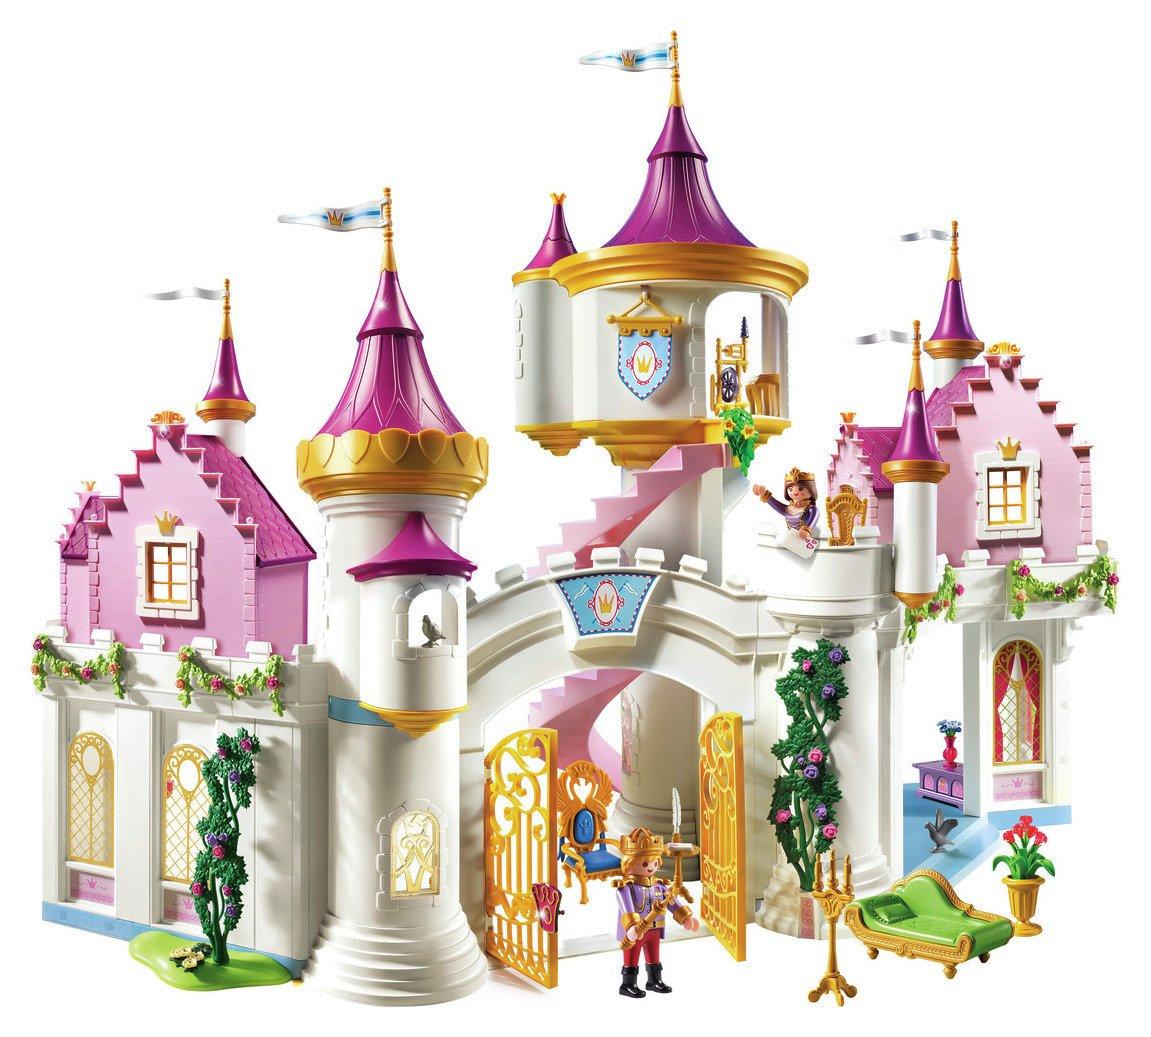 Playmobil 6848 Grand Princess Castle Playset £50 @ Argos